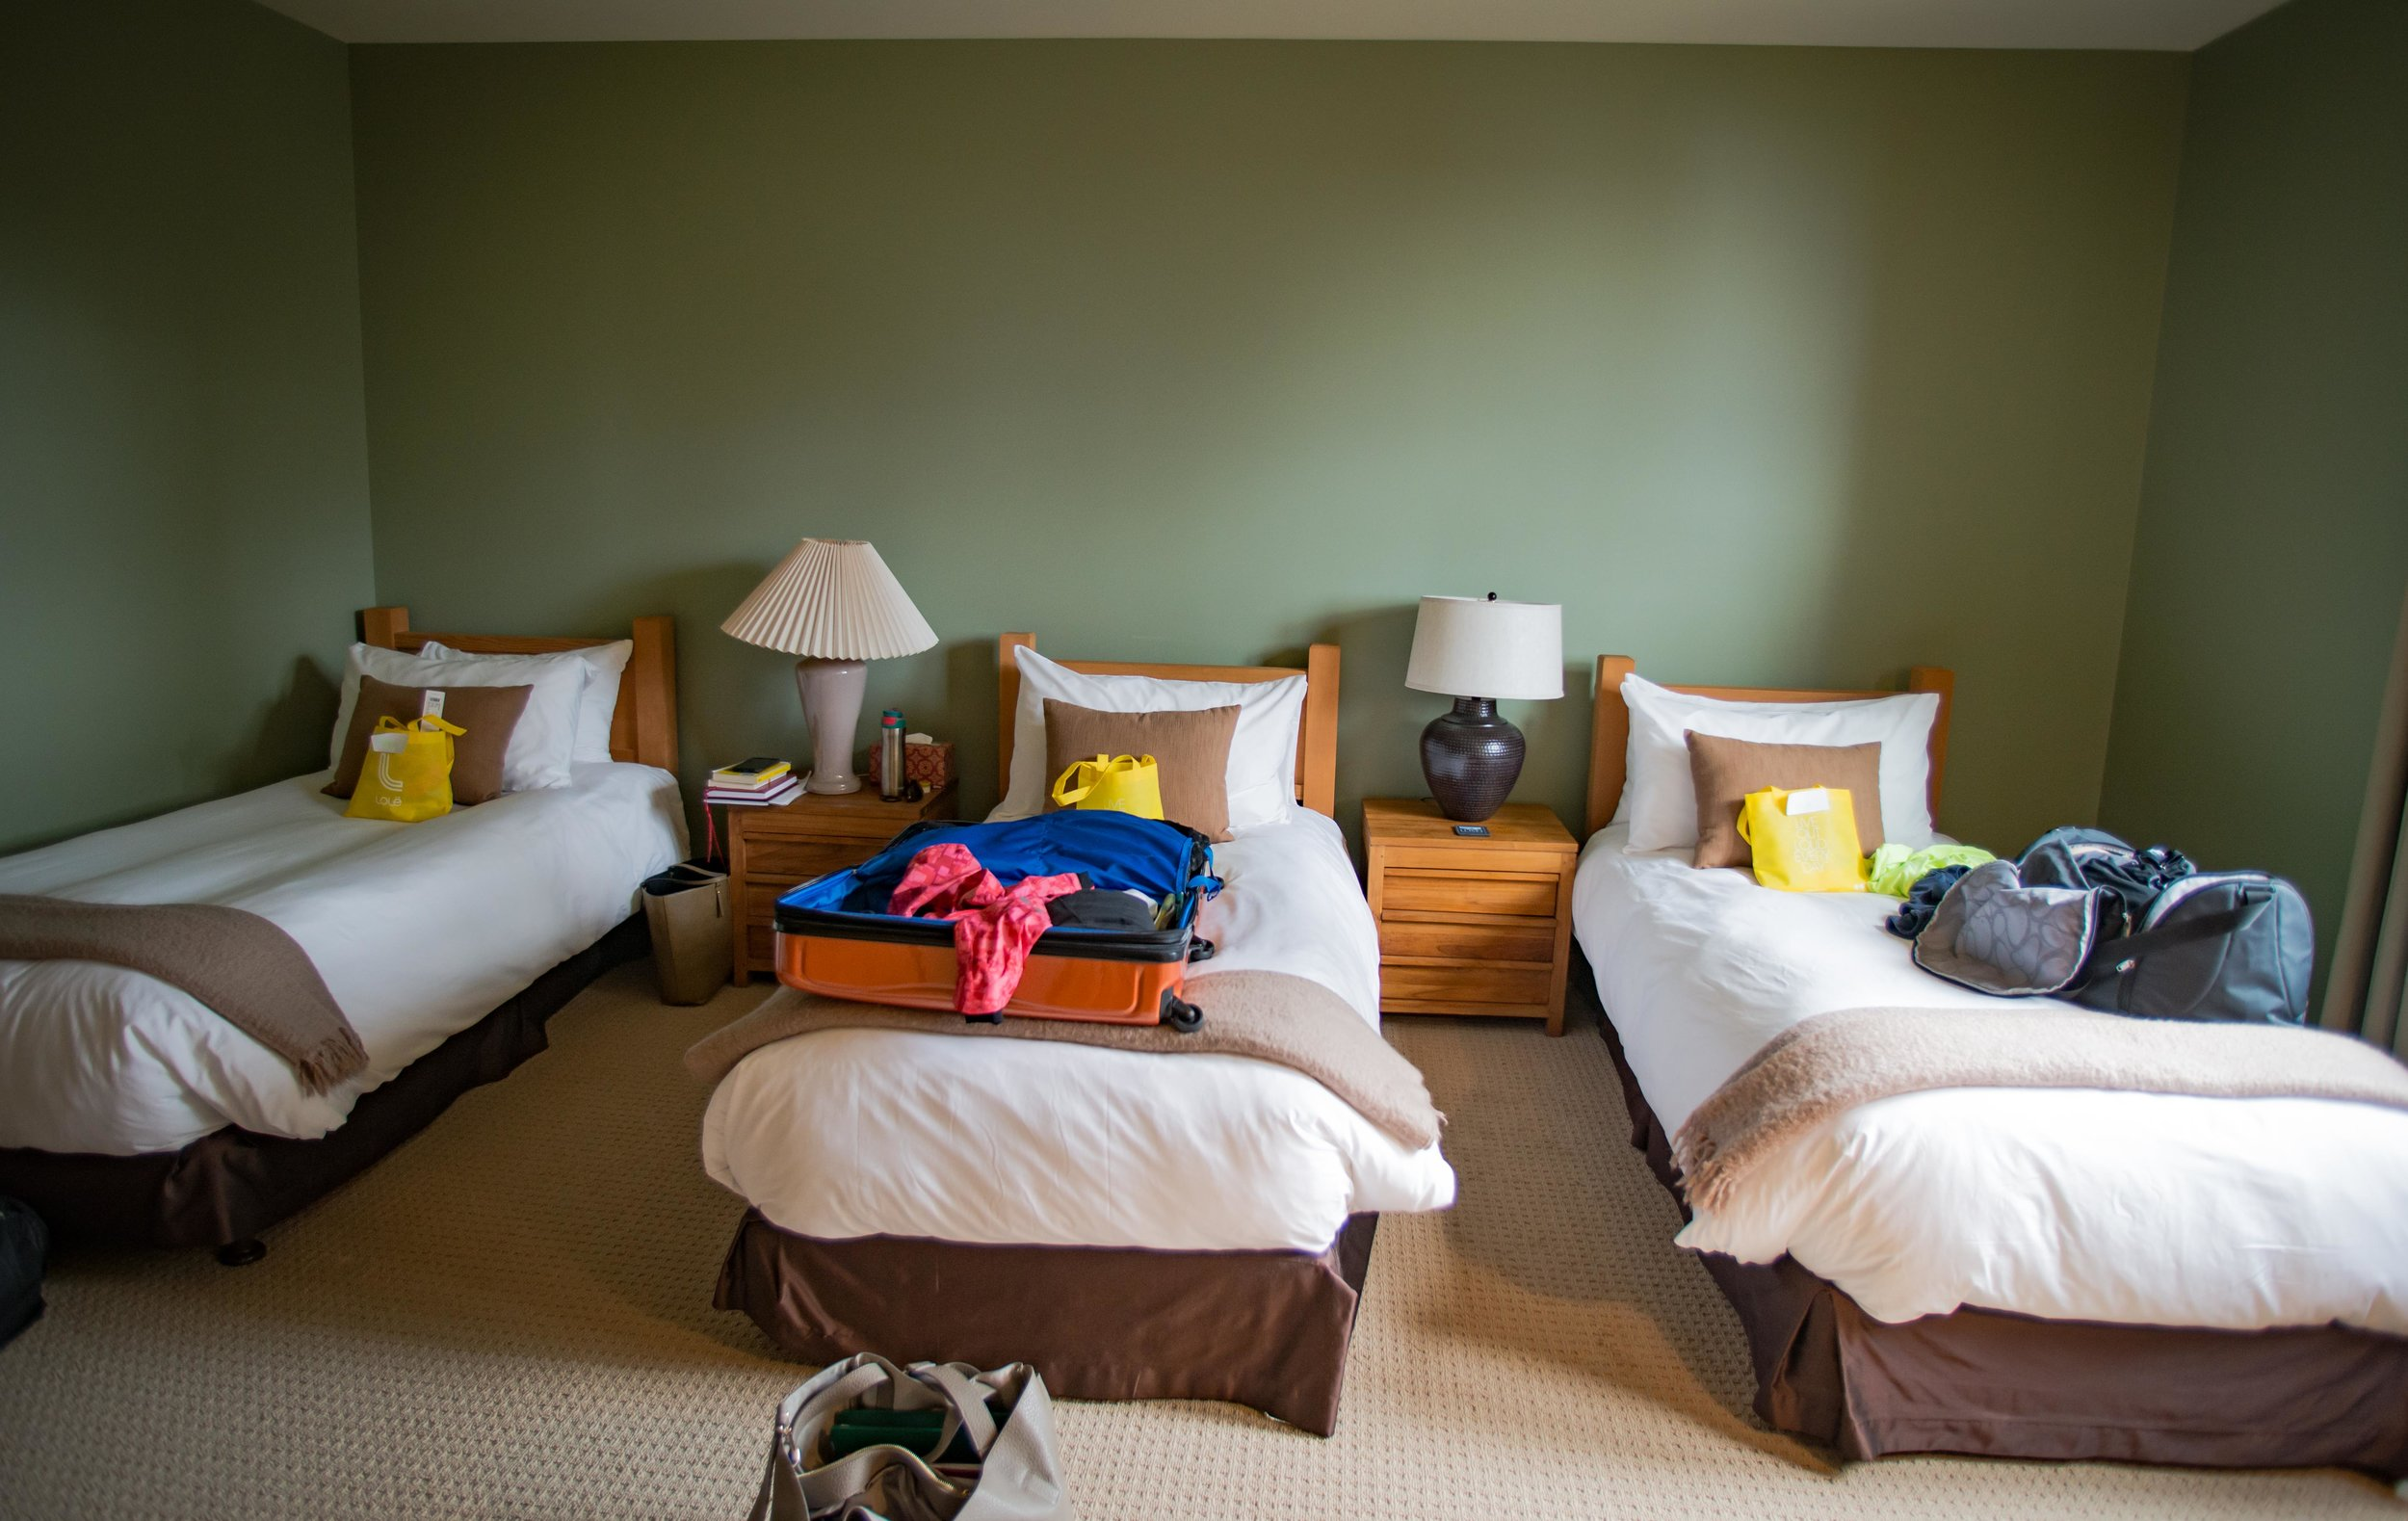 running-yoga-retreat-lush-acomadation-golden-emerald-lake-lodge-6.jpg